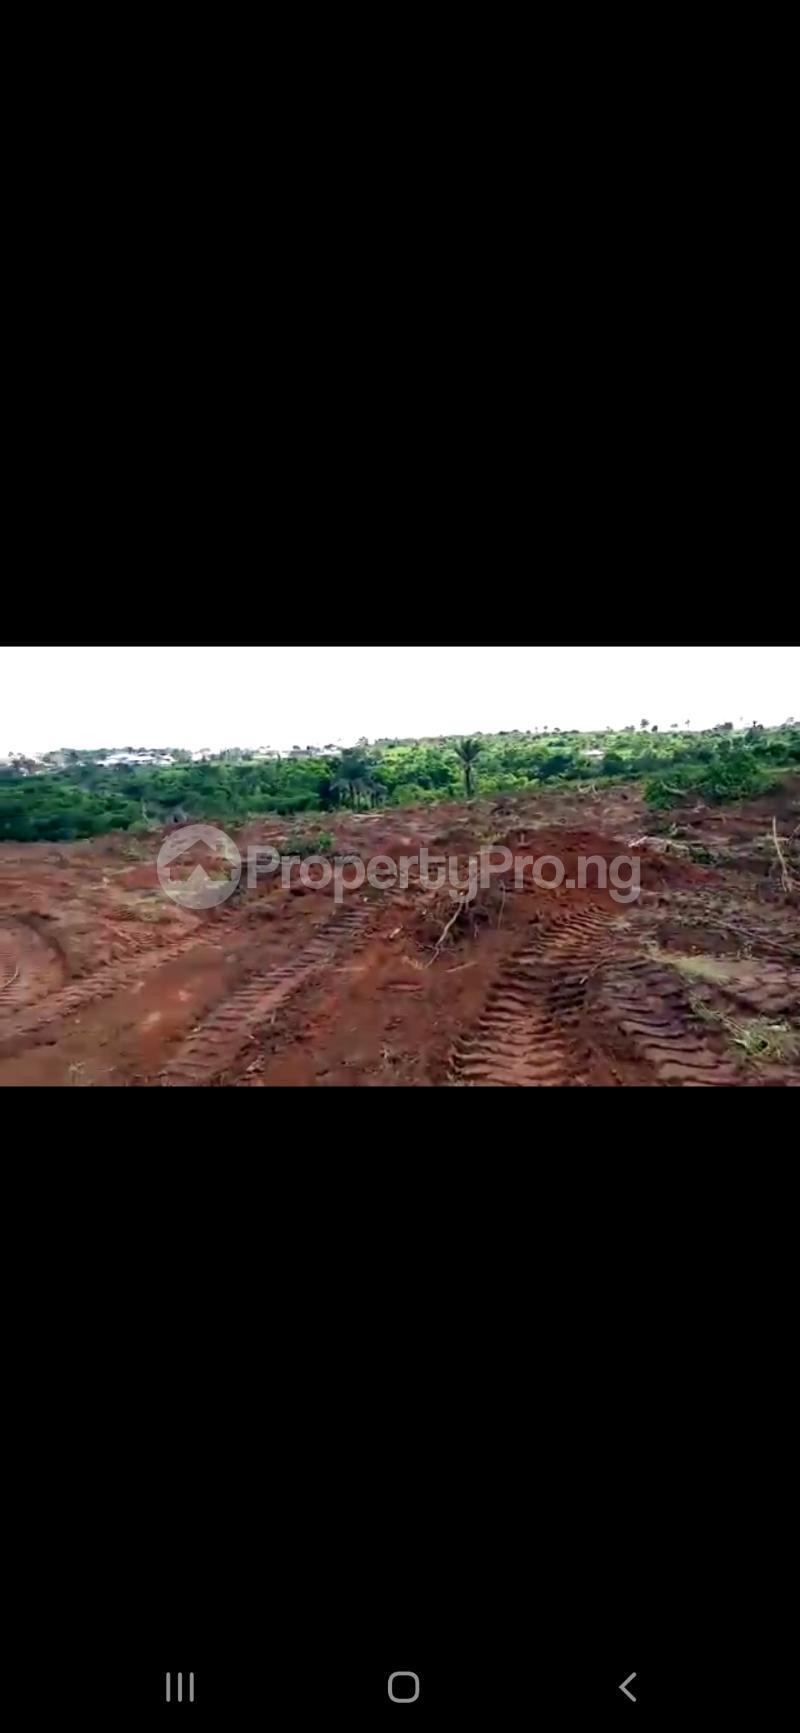 Residential Land Land for sale Asaba Delta - 6